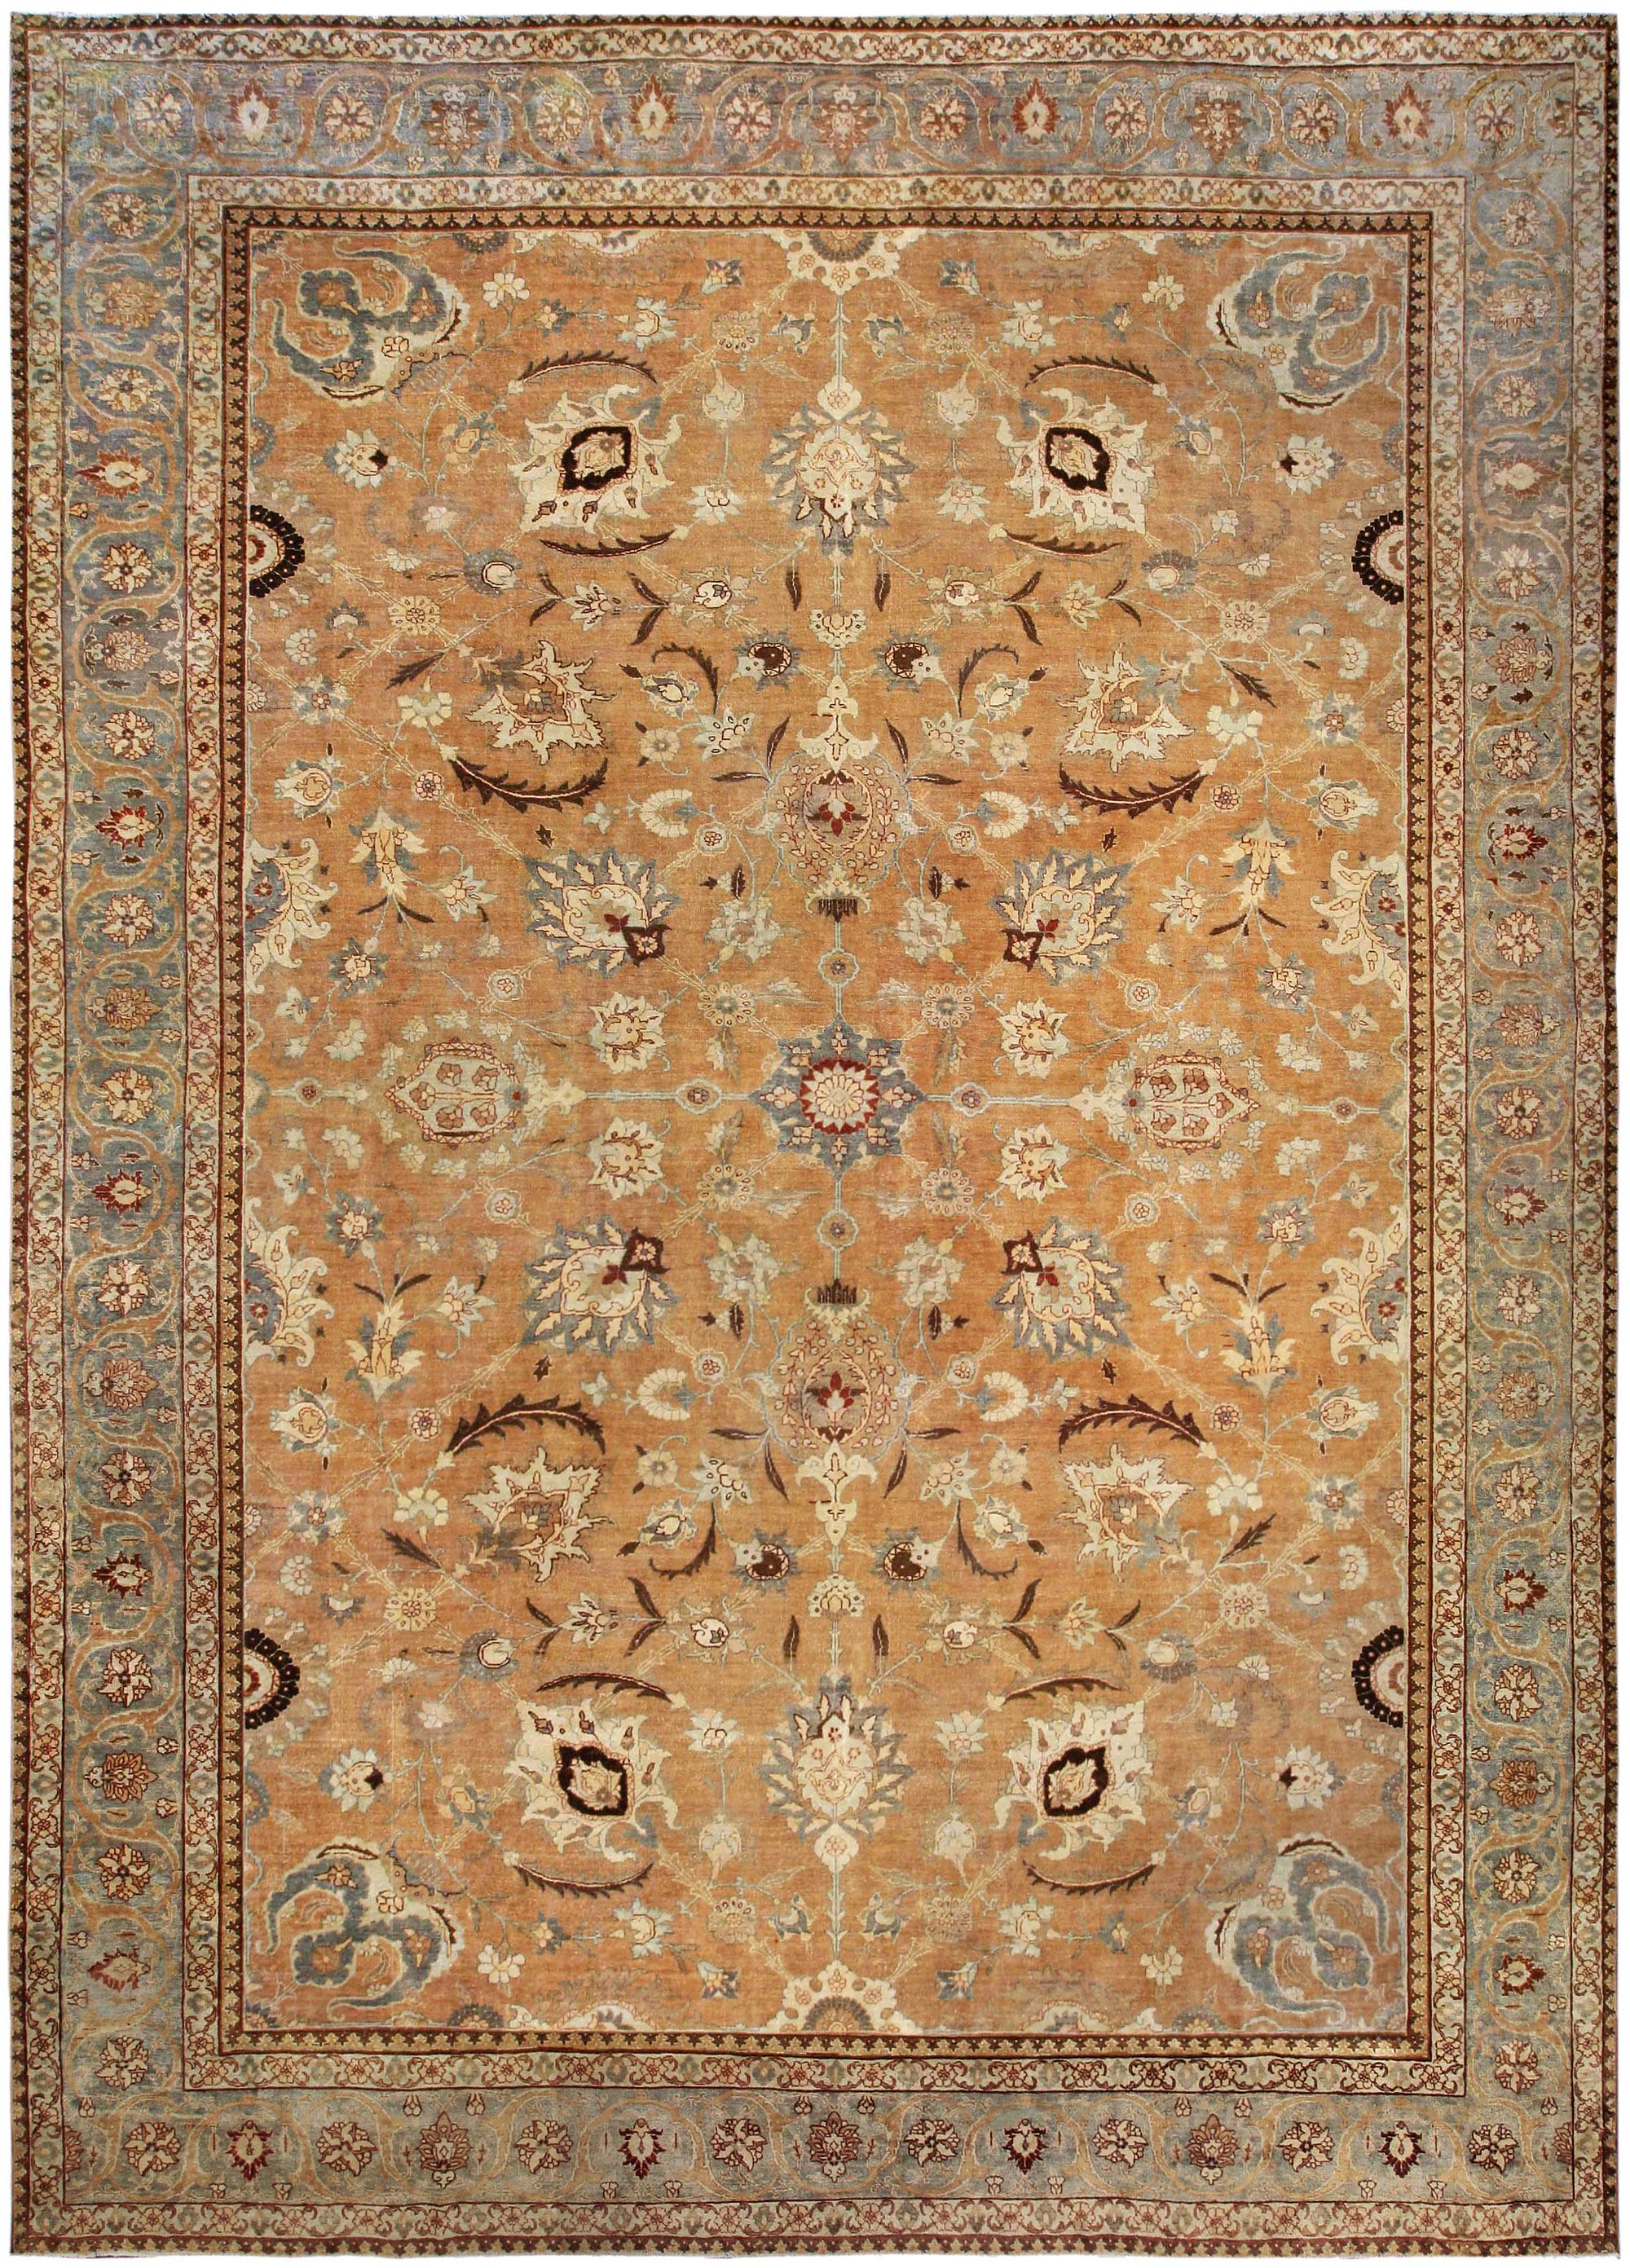 Antique Persian Tabriz Rug Bb4081 By Doris Leslie Blau